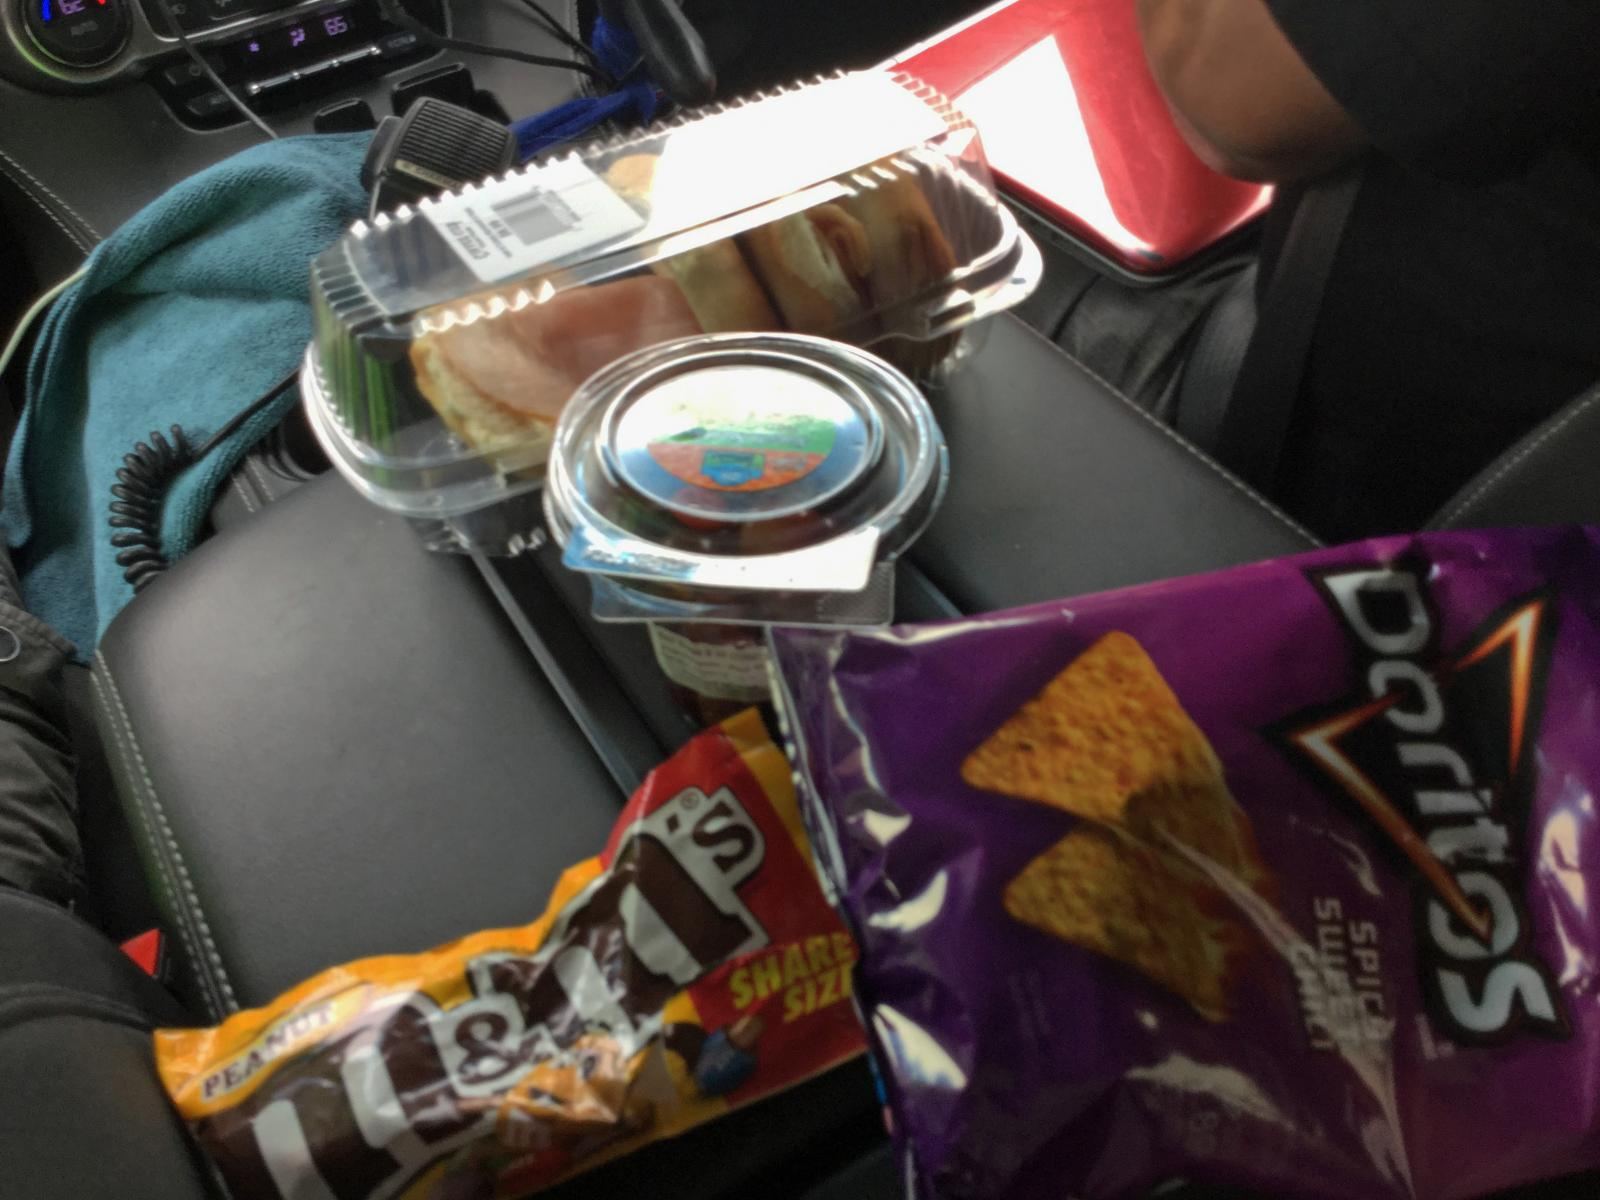 Storm chasing snacks